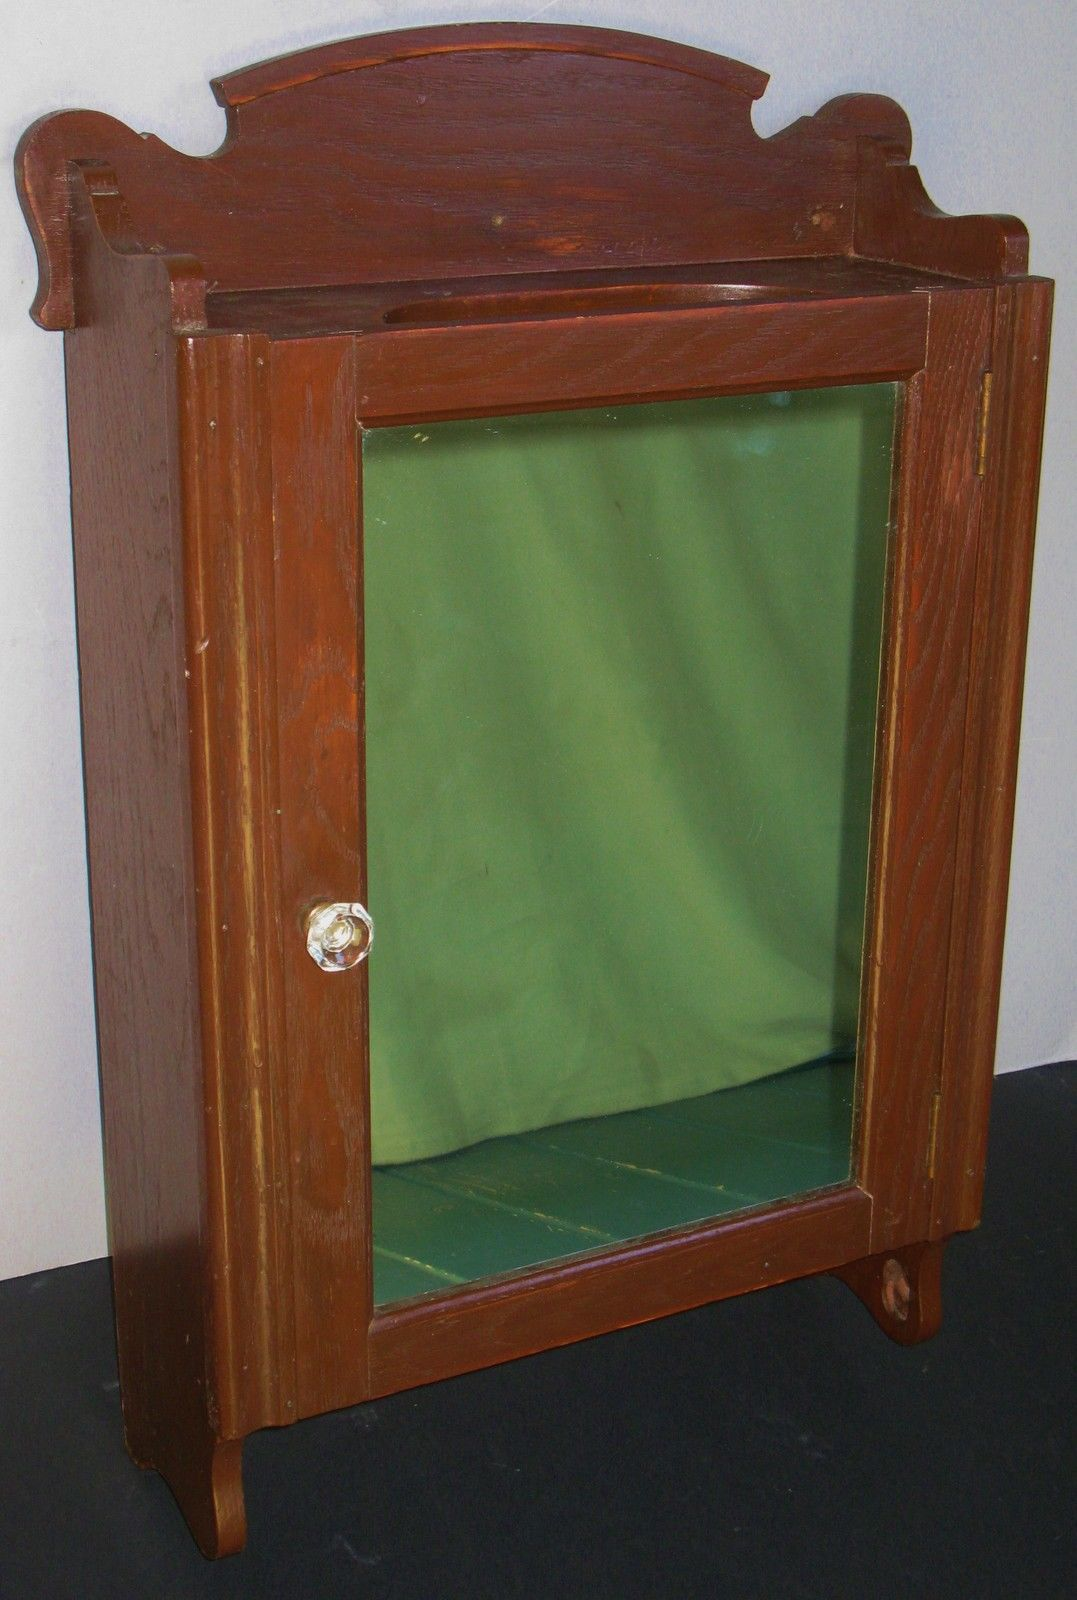 Antique Oak Wall Mount Medicine Cabinet Mirror Glass Amp Wood Shelves Ebay Wall Mounted Medicine Cabinet Vintage Bathroom Wooden Bathroom Furniture